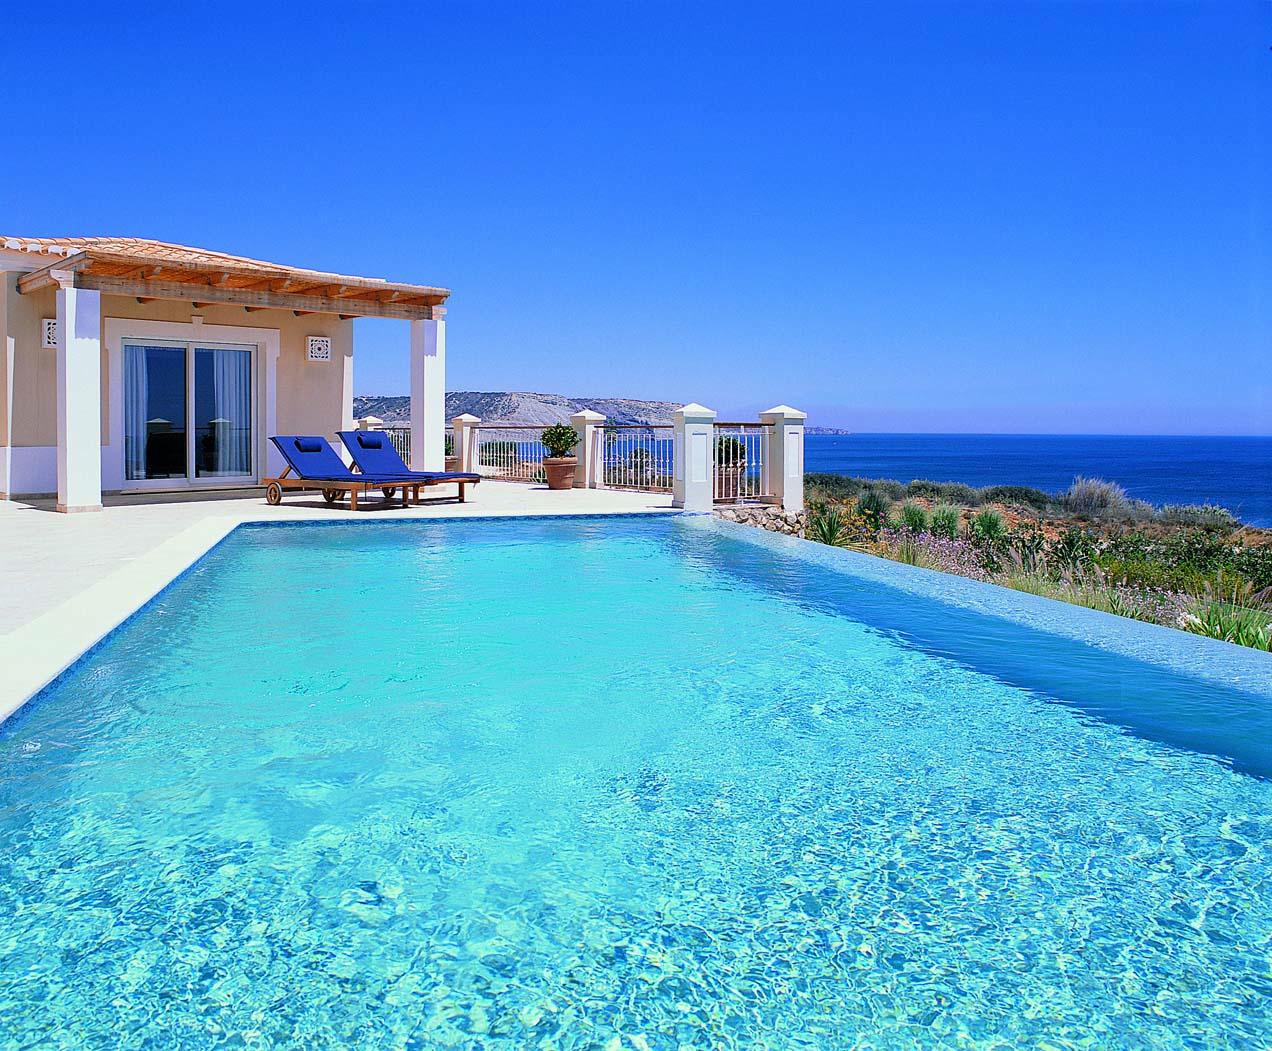 Stunning Villa with Sea Views in Praia da Luz  - The beautiful costal development with breathtaking sea views in Praia da